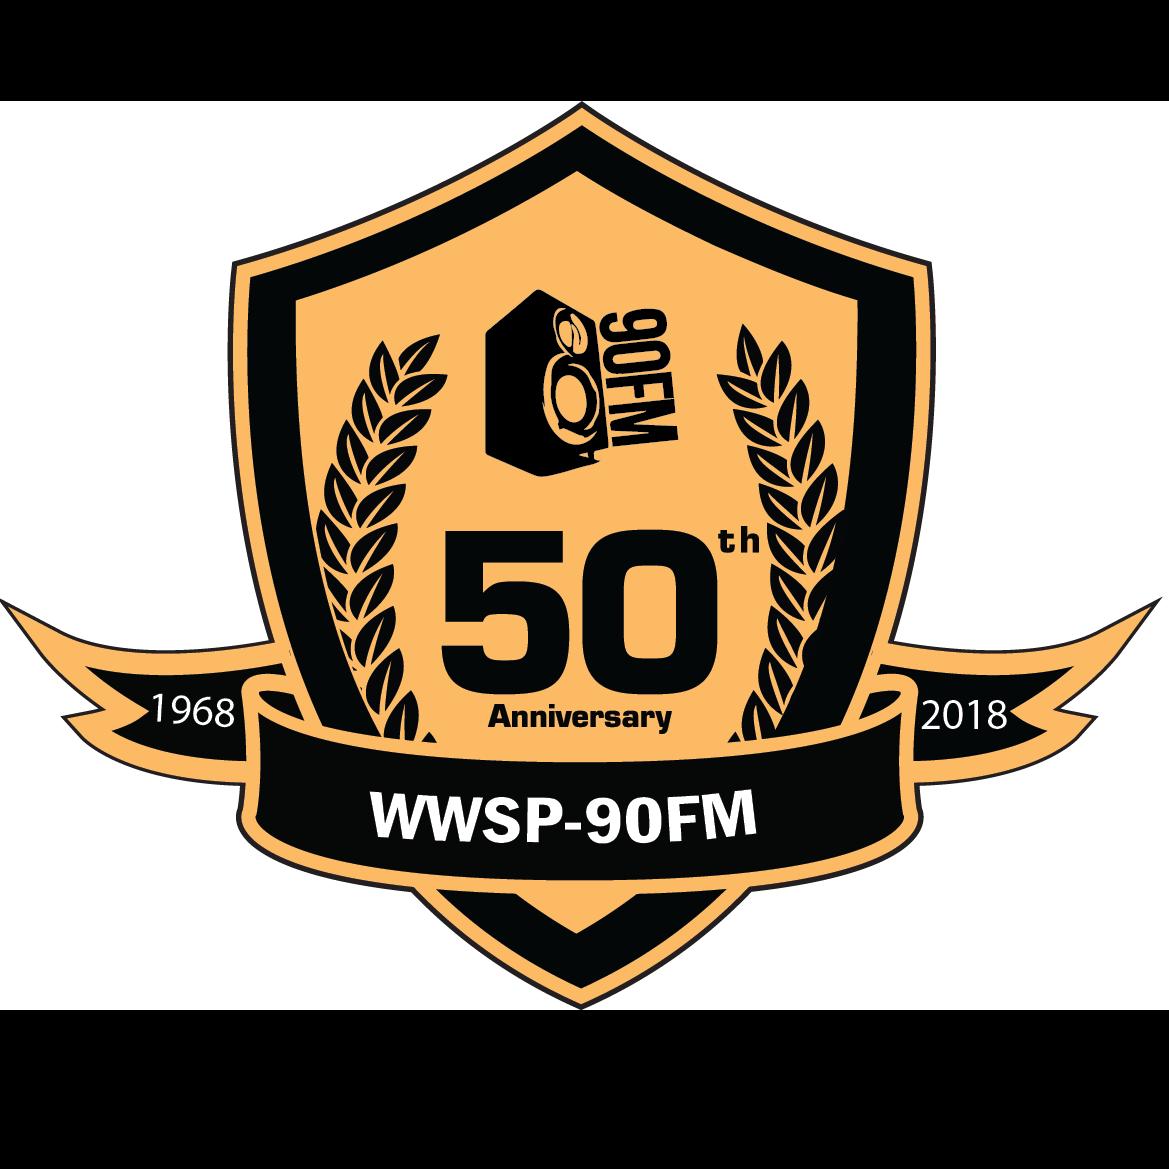 WWSP-90FM